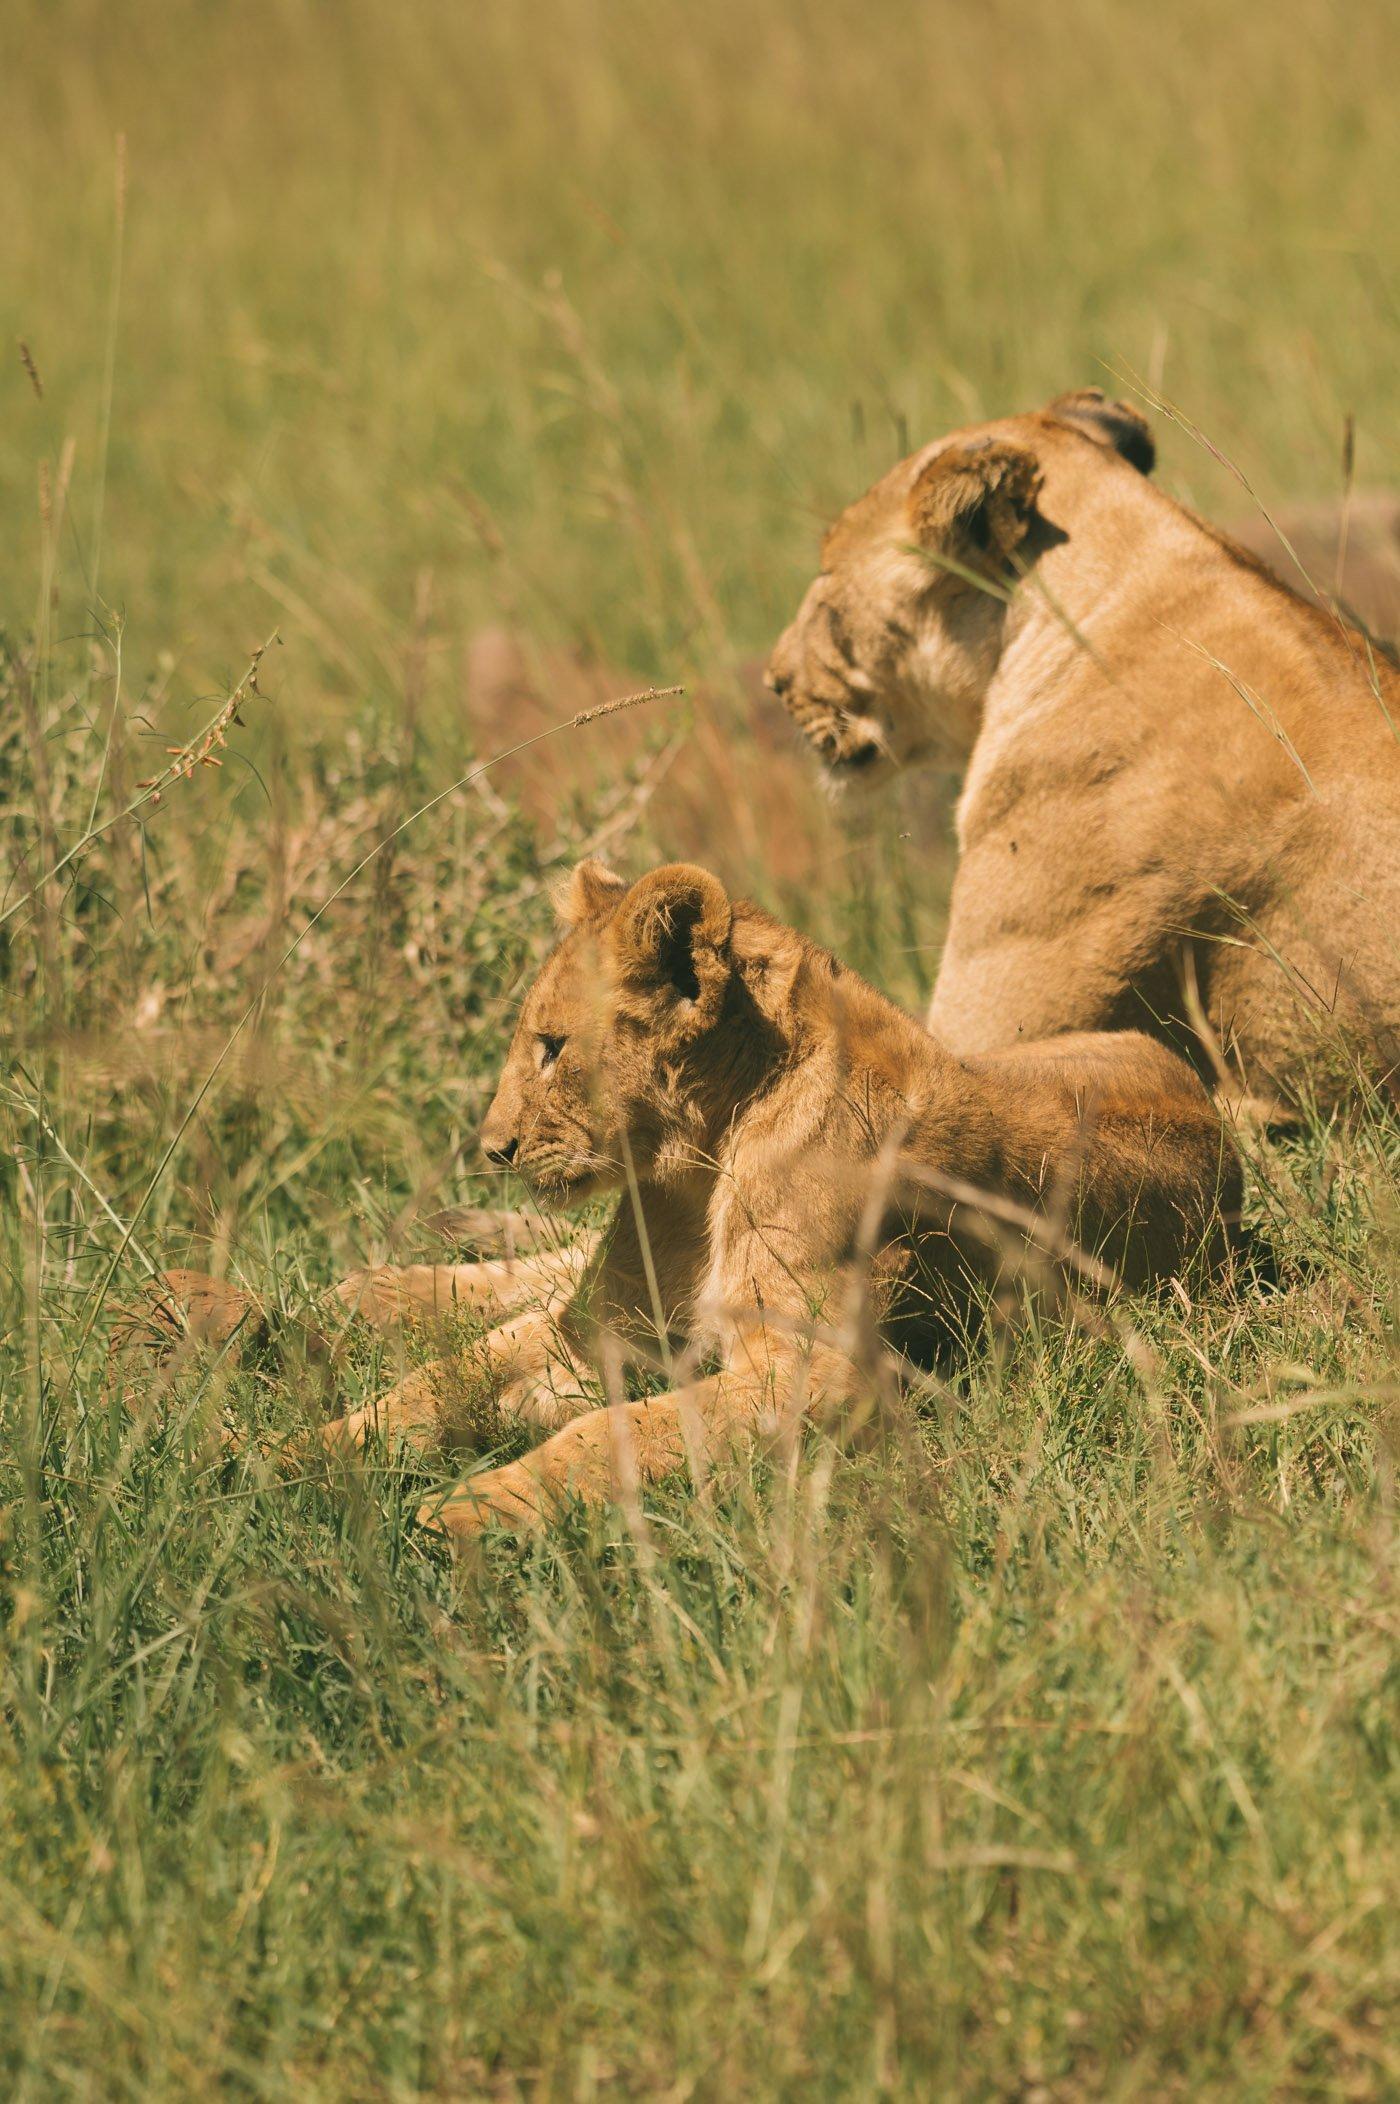 Lions in the Maasai Mara in Kenya